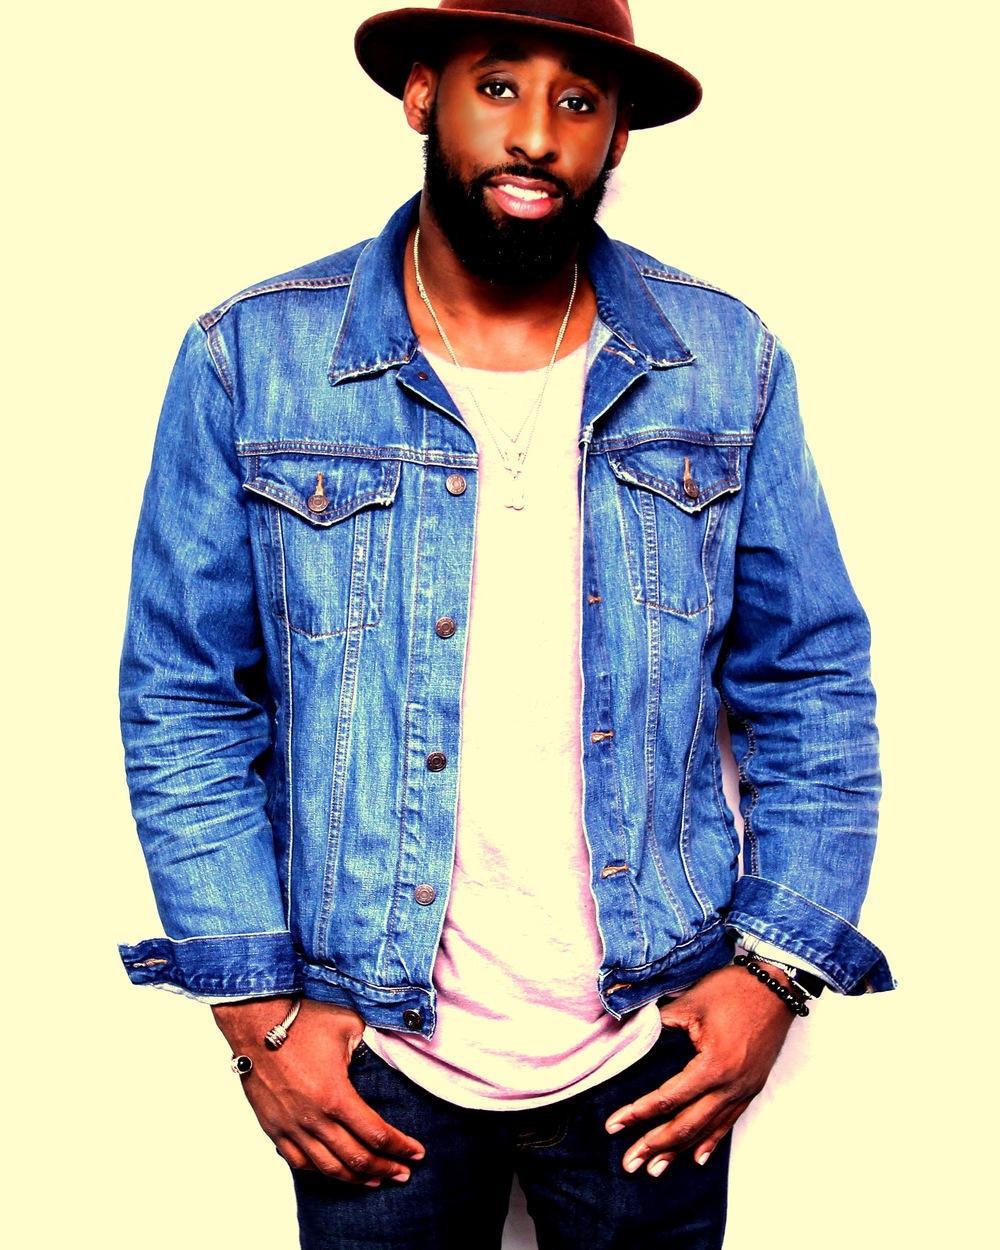 Renaldo 'DJ Puff' Wilson, Professional DJ & Radio Personality